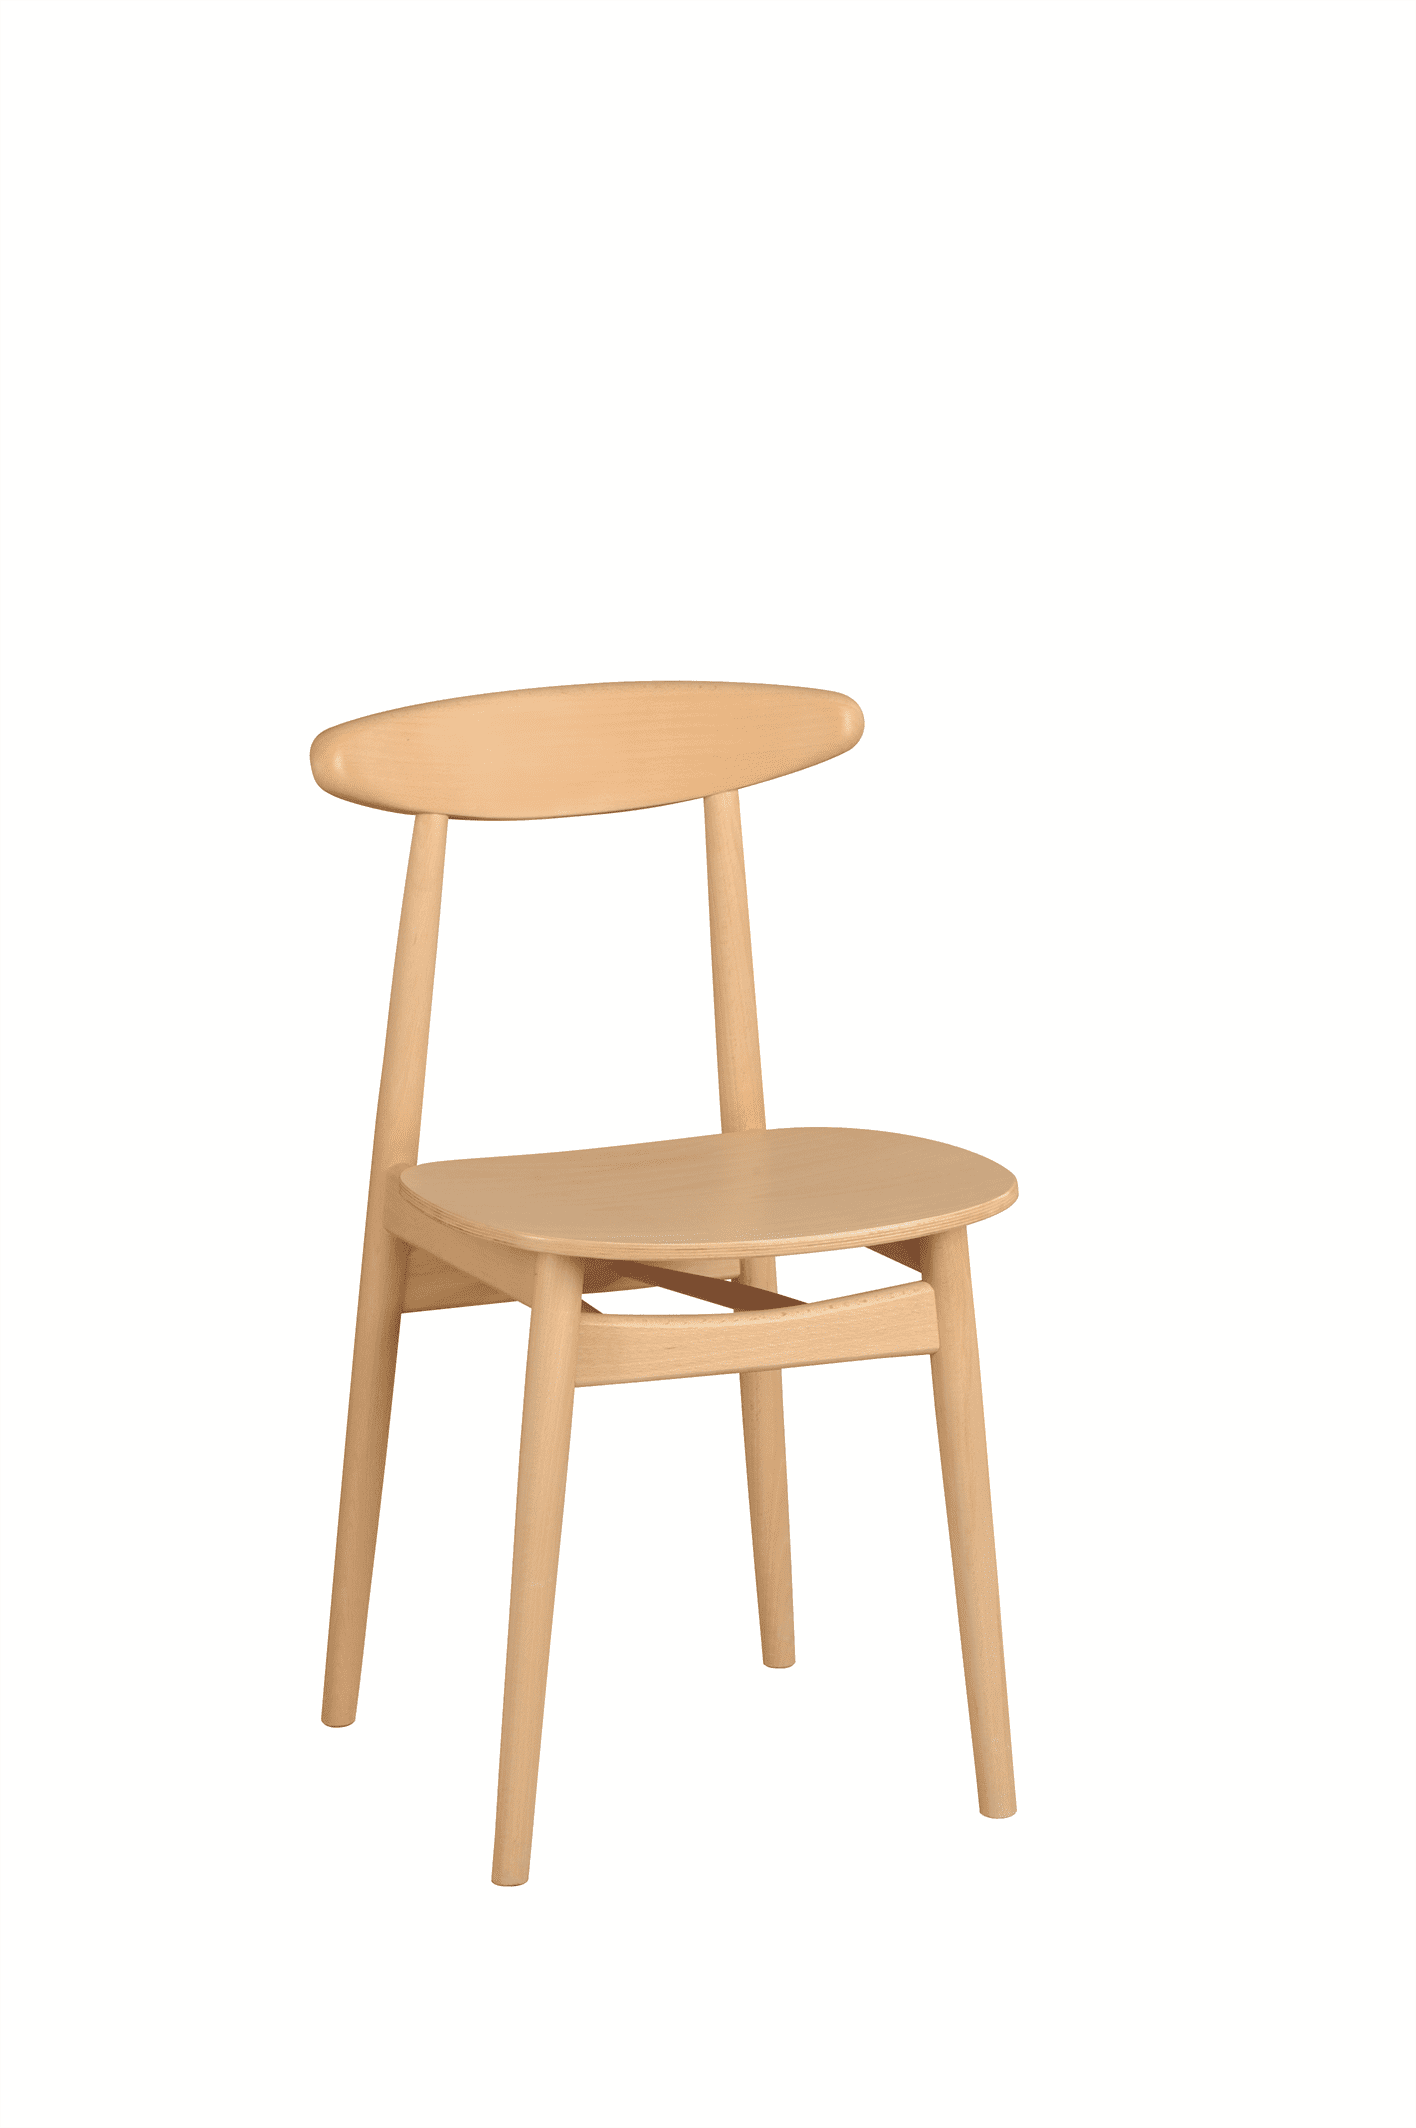 Kitty side chair veneer seat raw